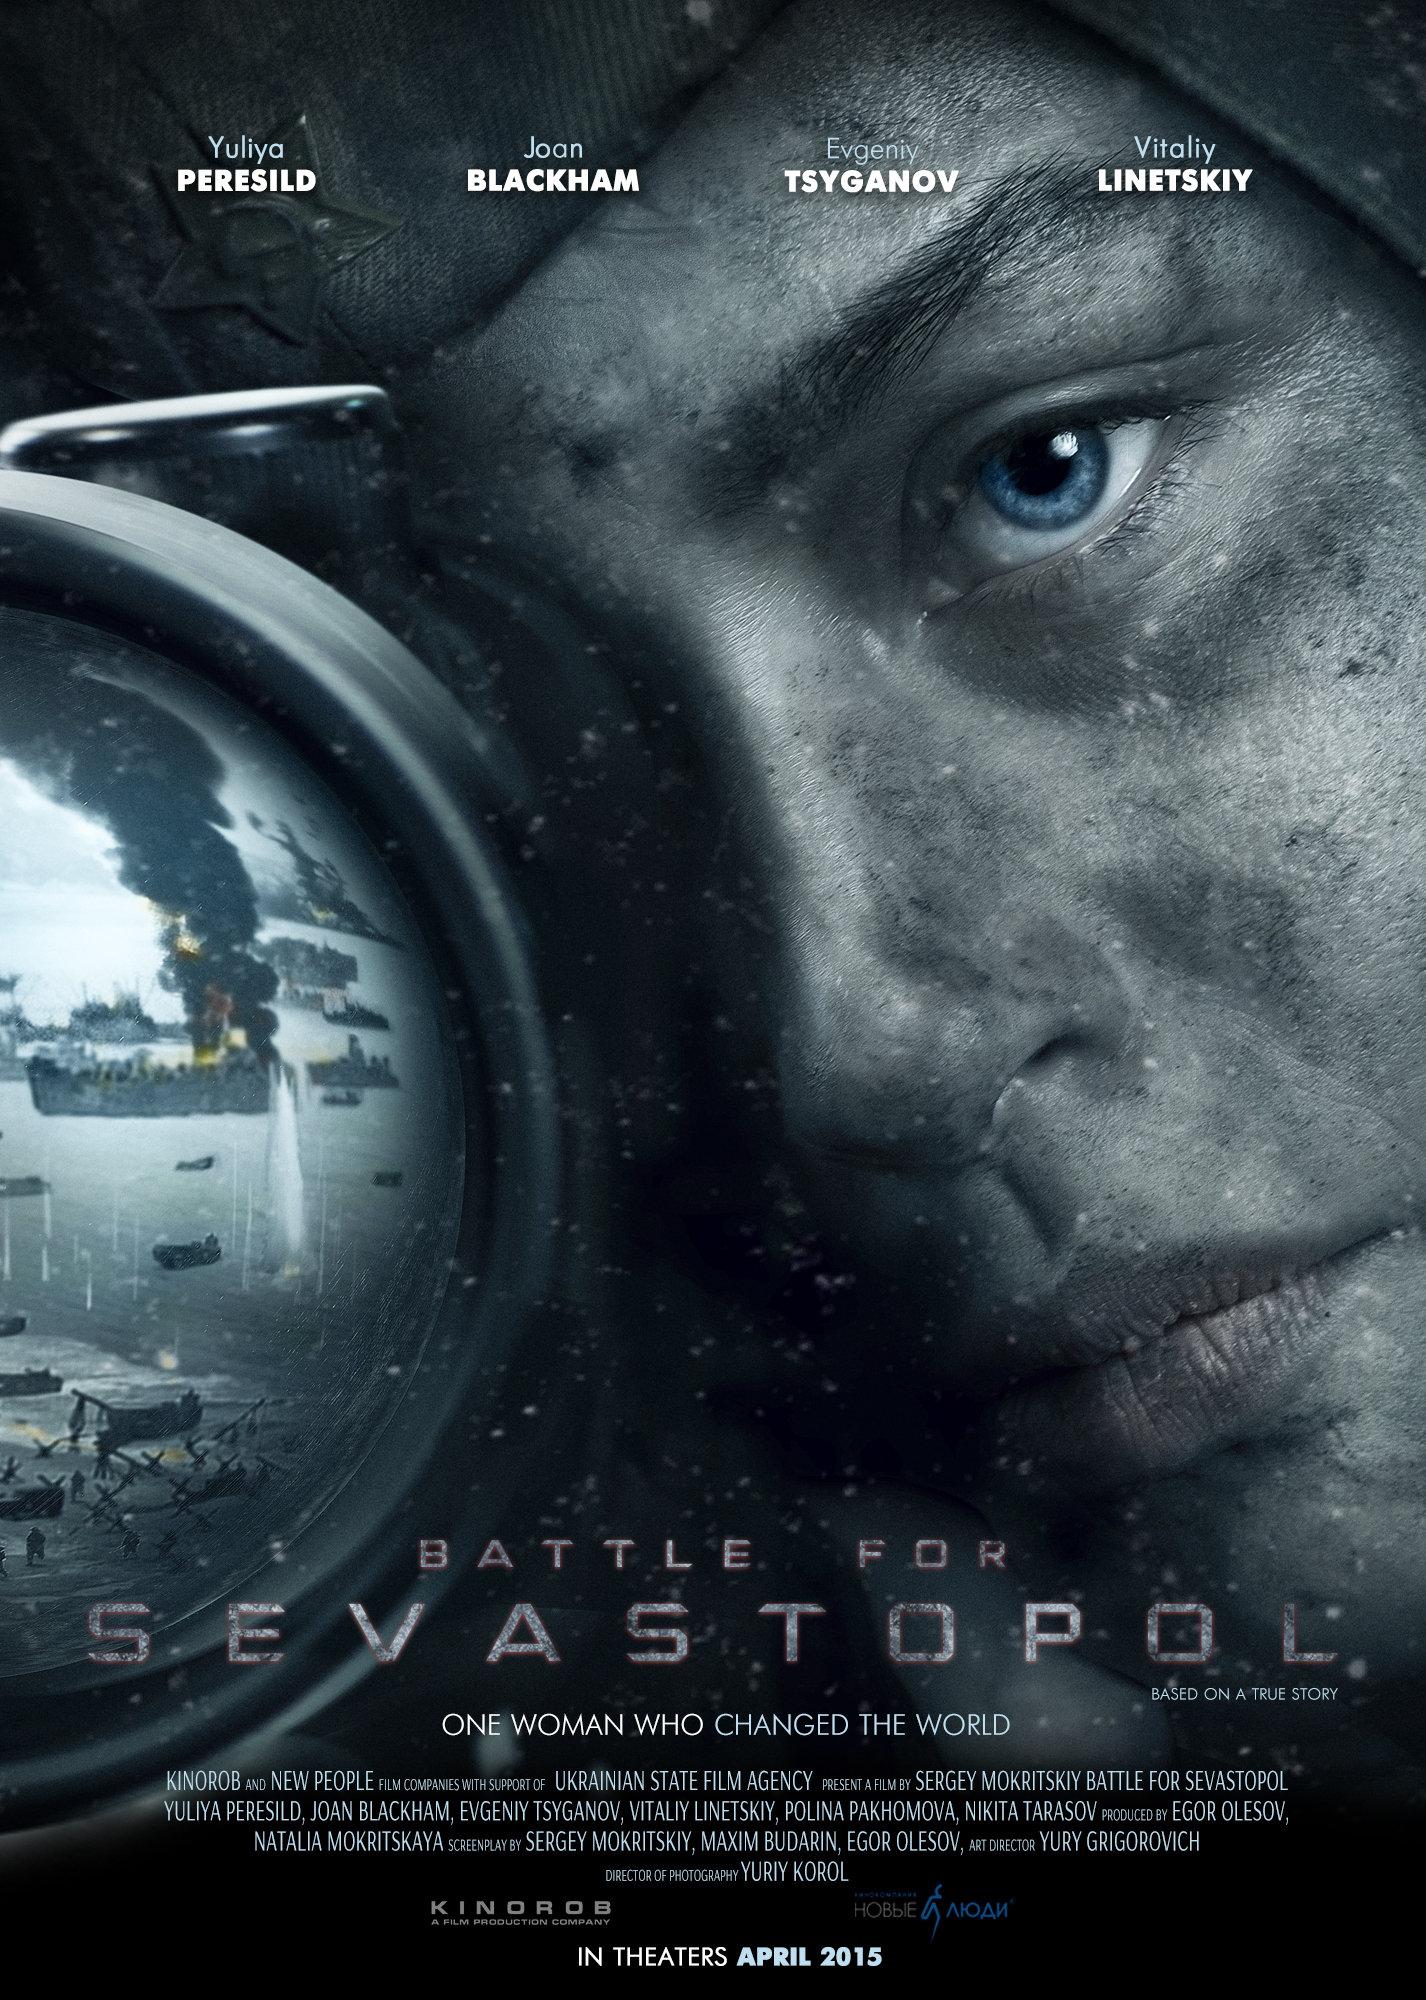 TsPSiR on Sevastopol: reviews 64